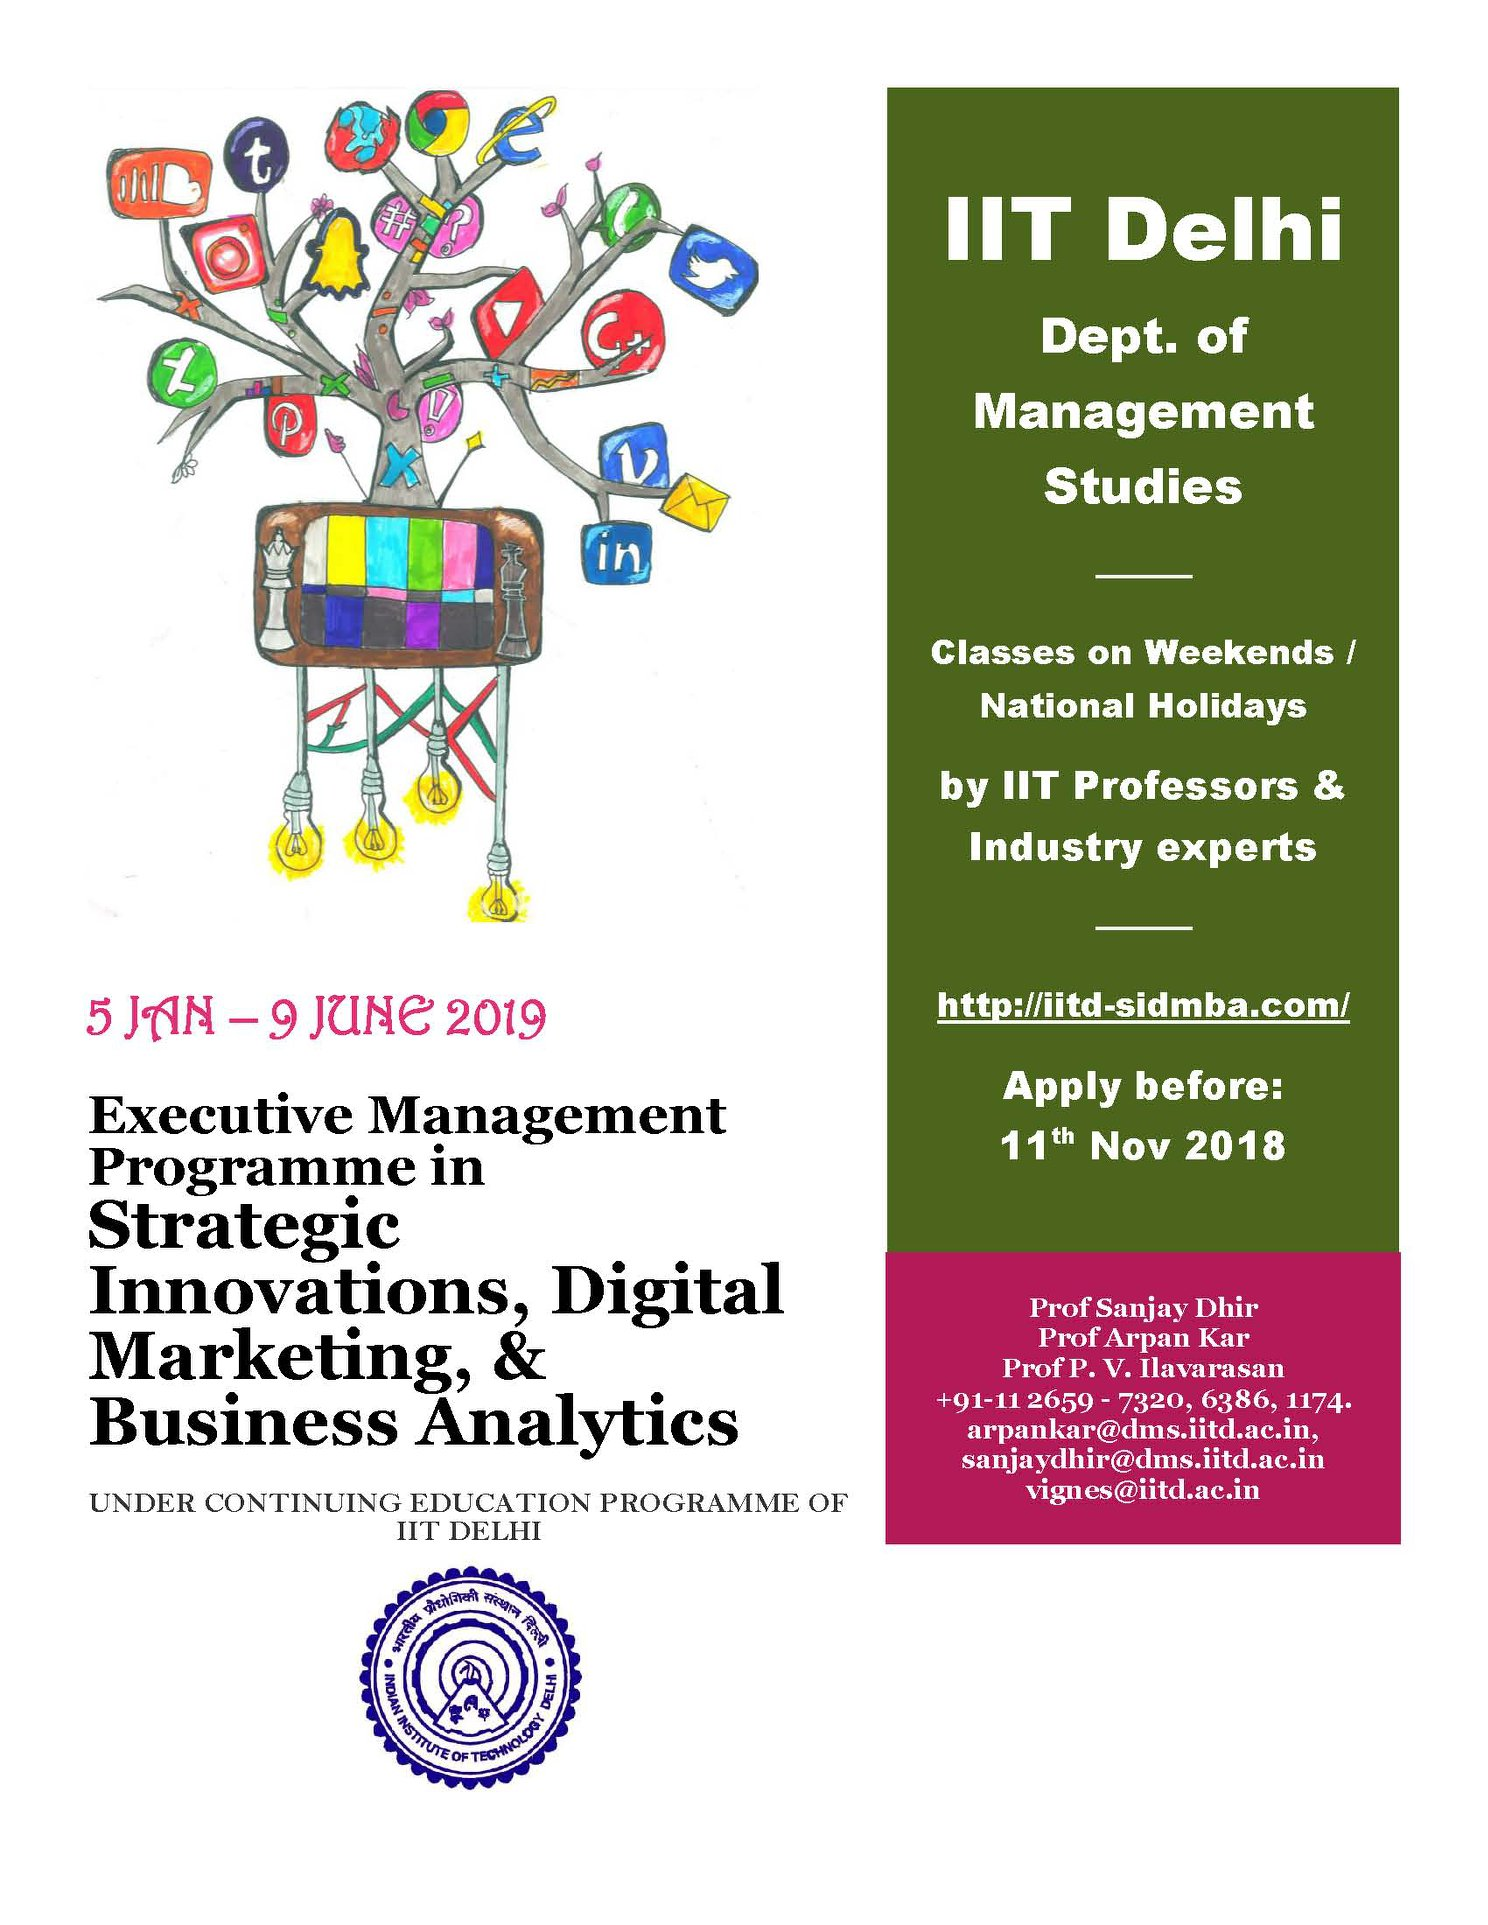 2019 Emp In Strategic Innovations Digital Marketing Business